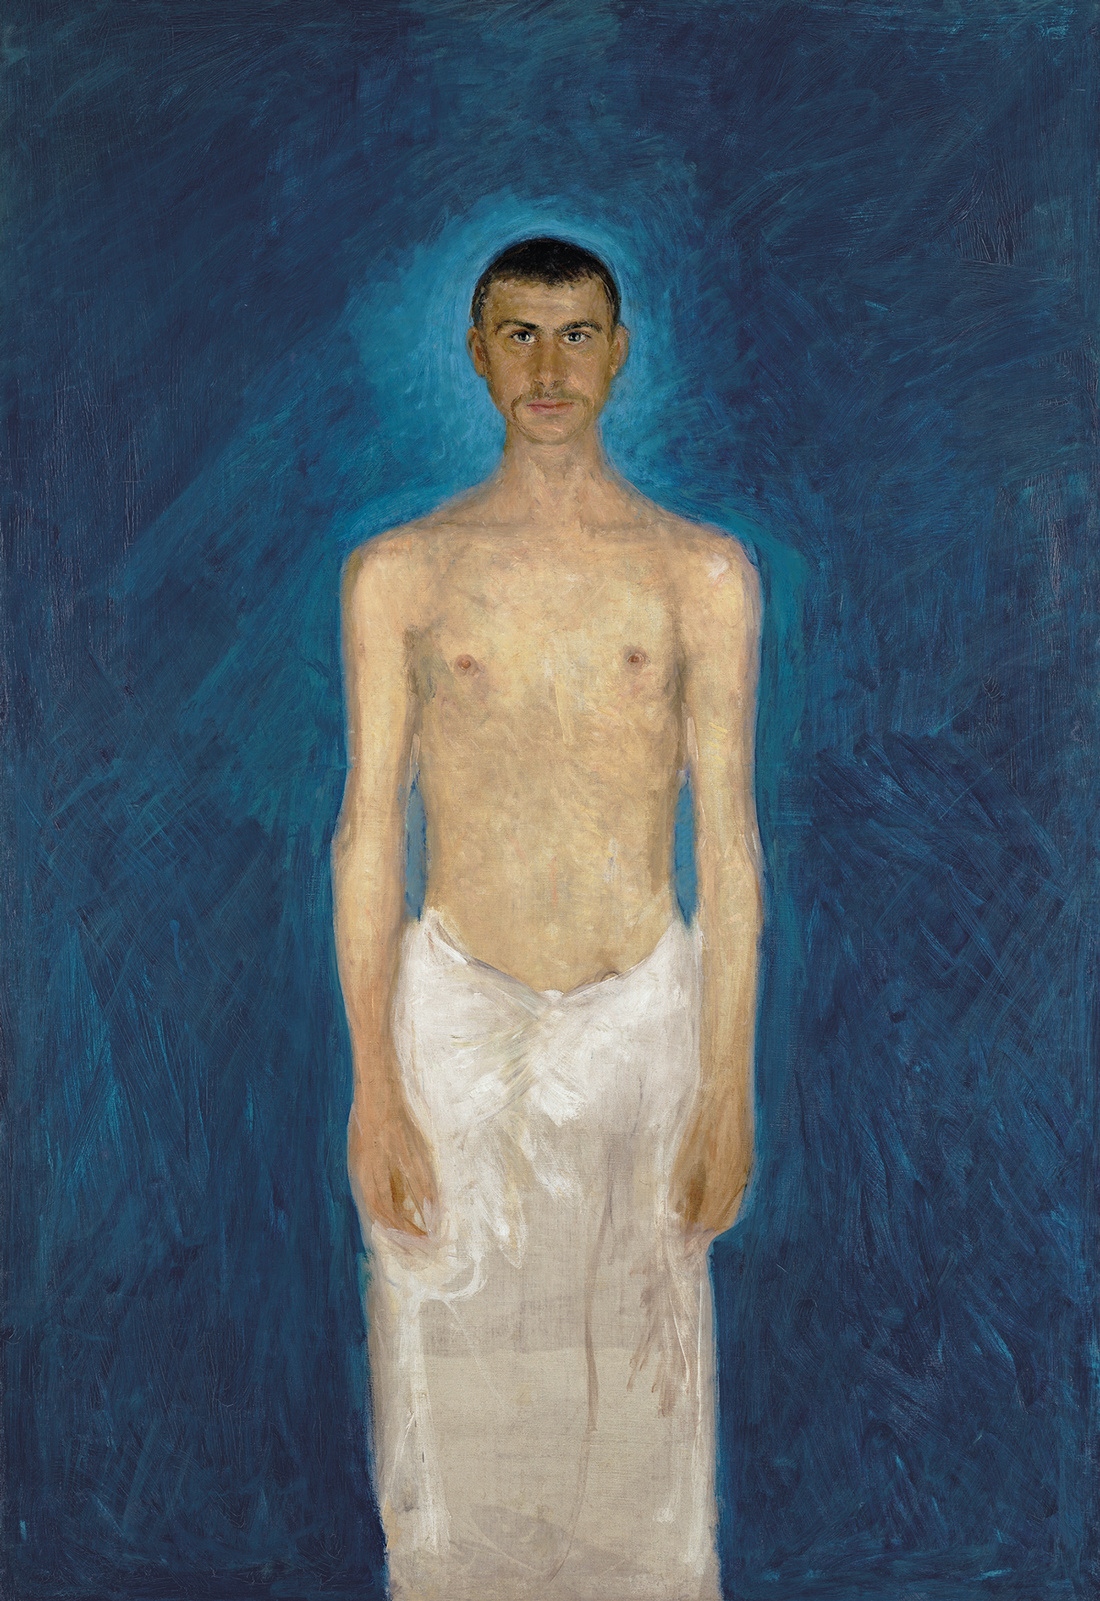 Gerstl, Semi-Nude Self-Portrait, 1902-04. Courtesy of the Leopold Museum, Vienna.